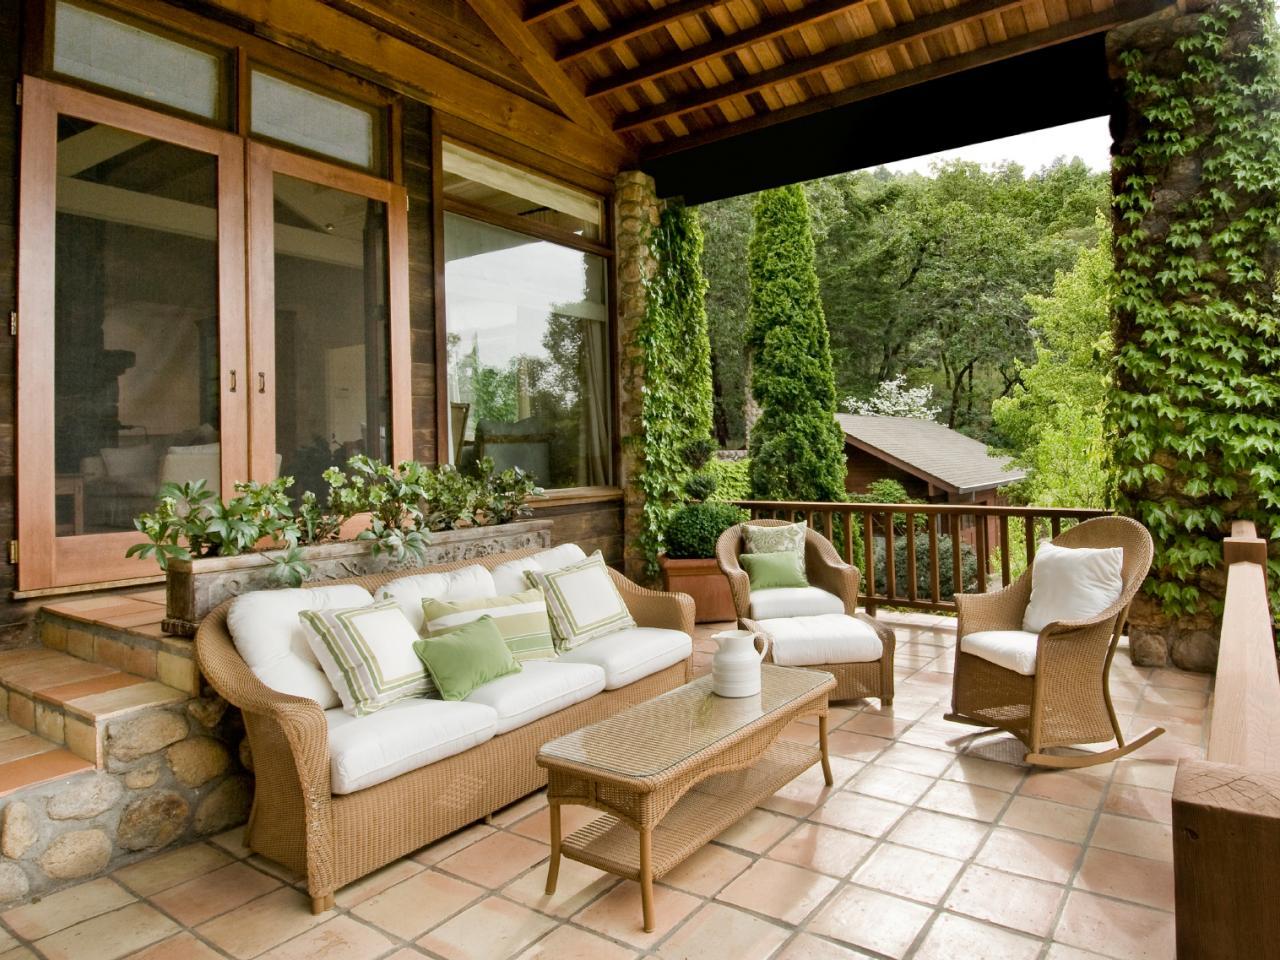 Luxury Under Foot: Outdoor Flooring Buyeru0027s Guide | DIY patio flooring options